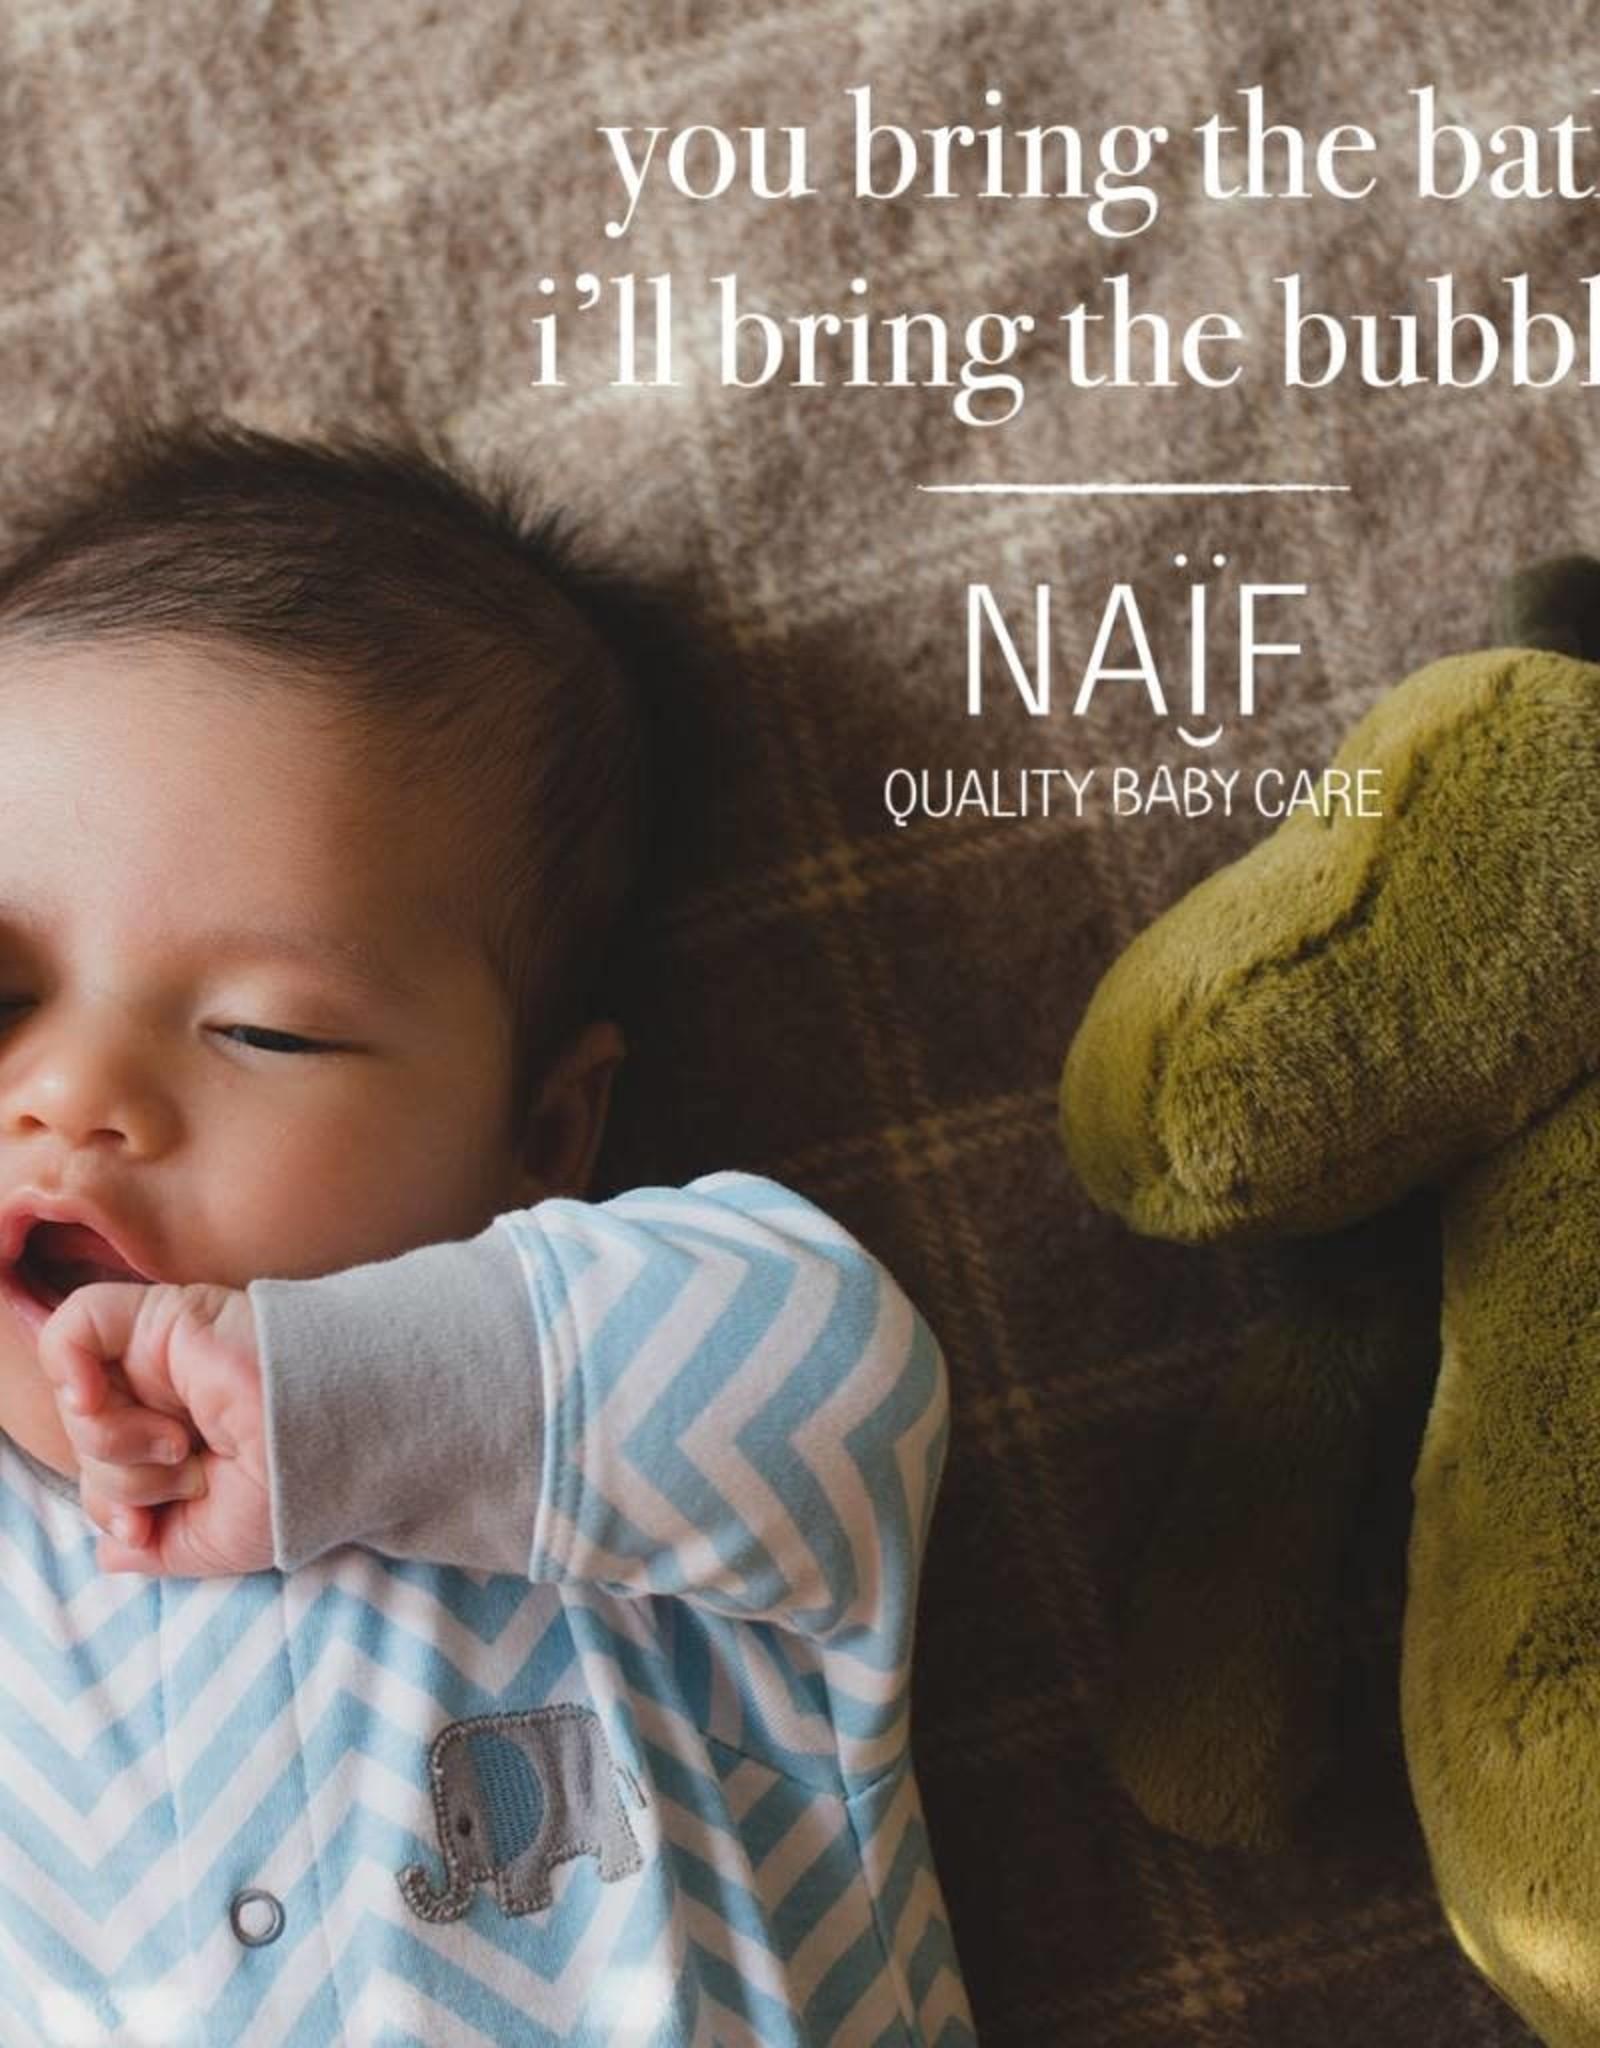 Naïf Quality Baby Care Baby Reisset - Naïf